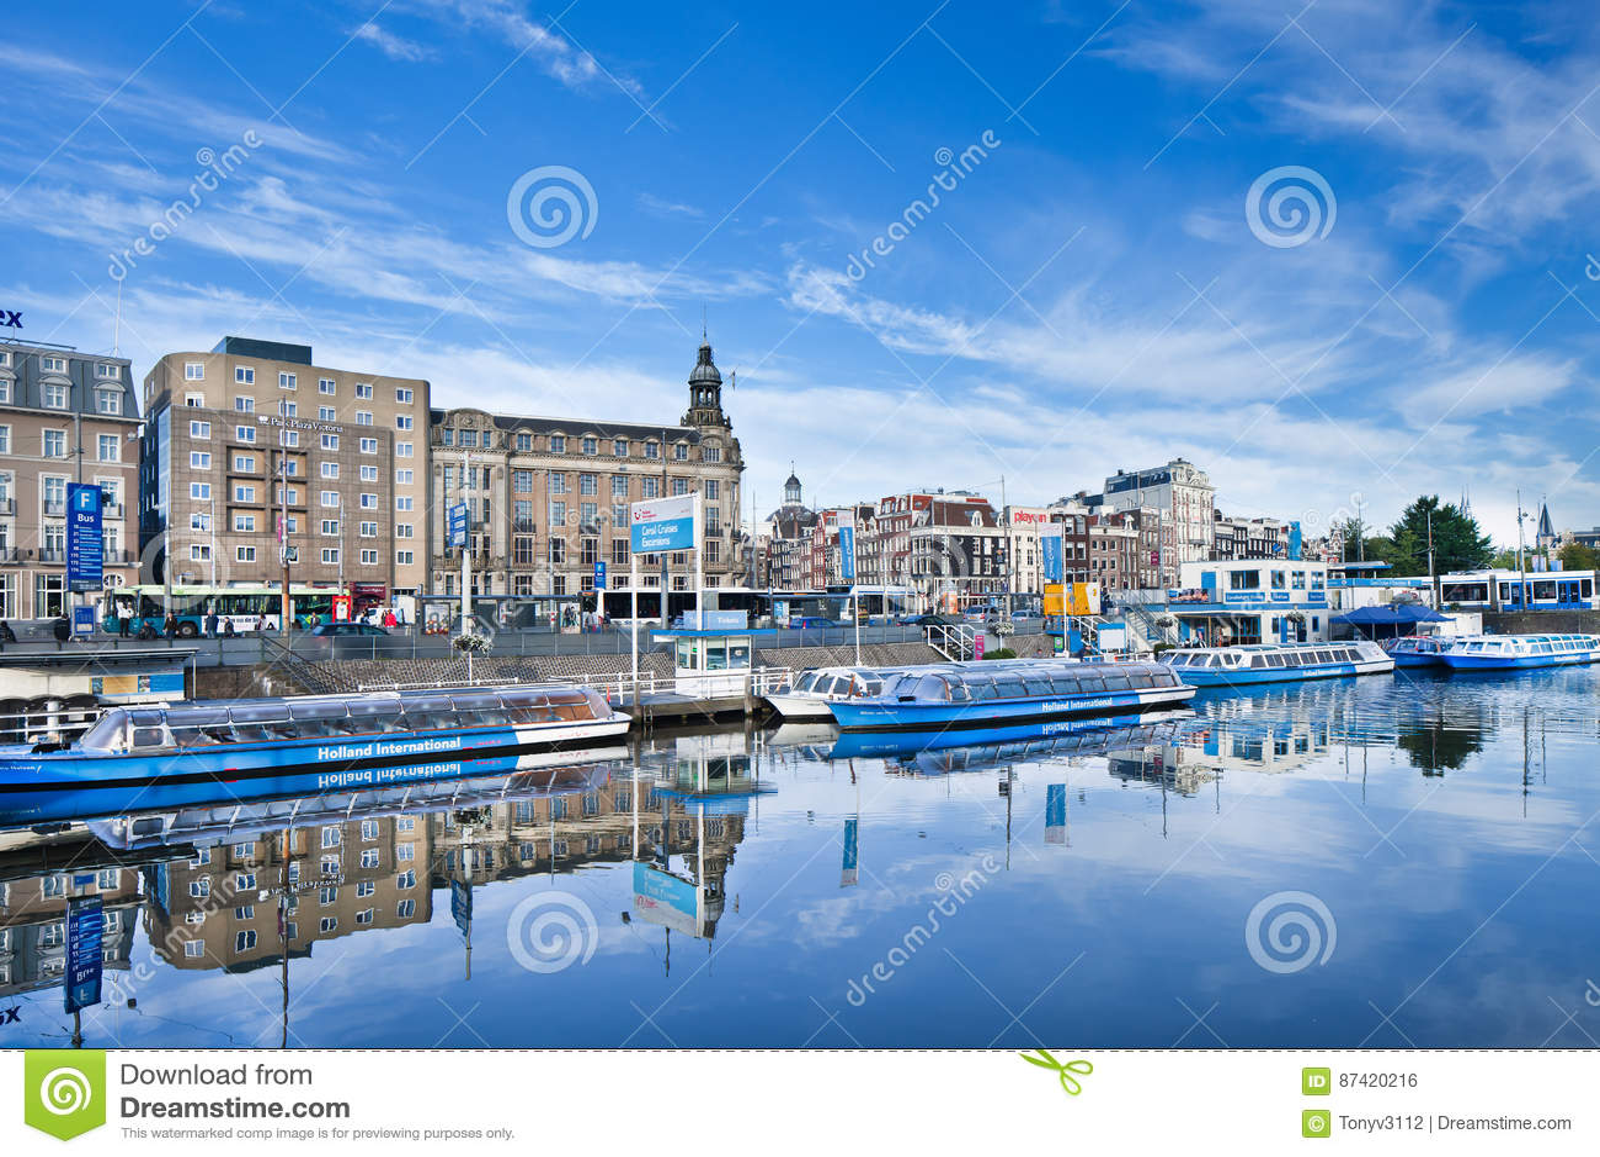 Blue Mansion Hotel Amsterdam